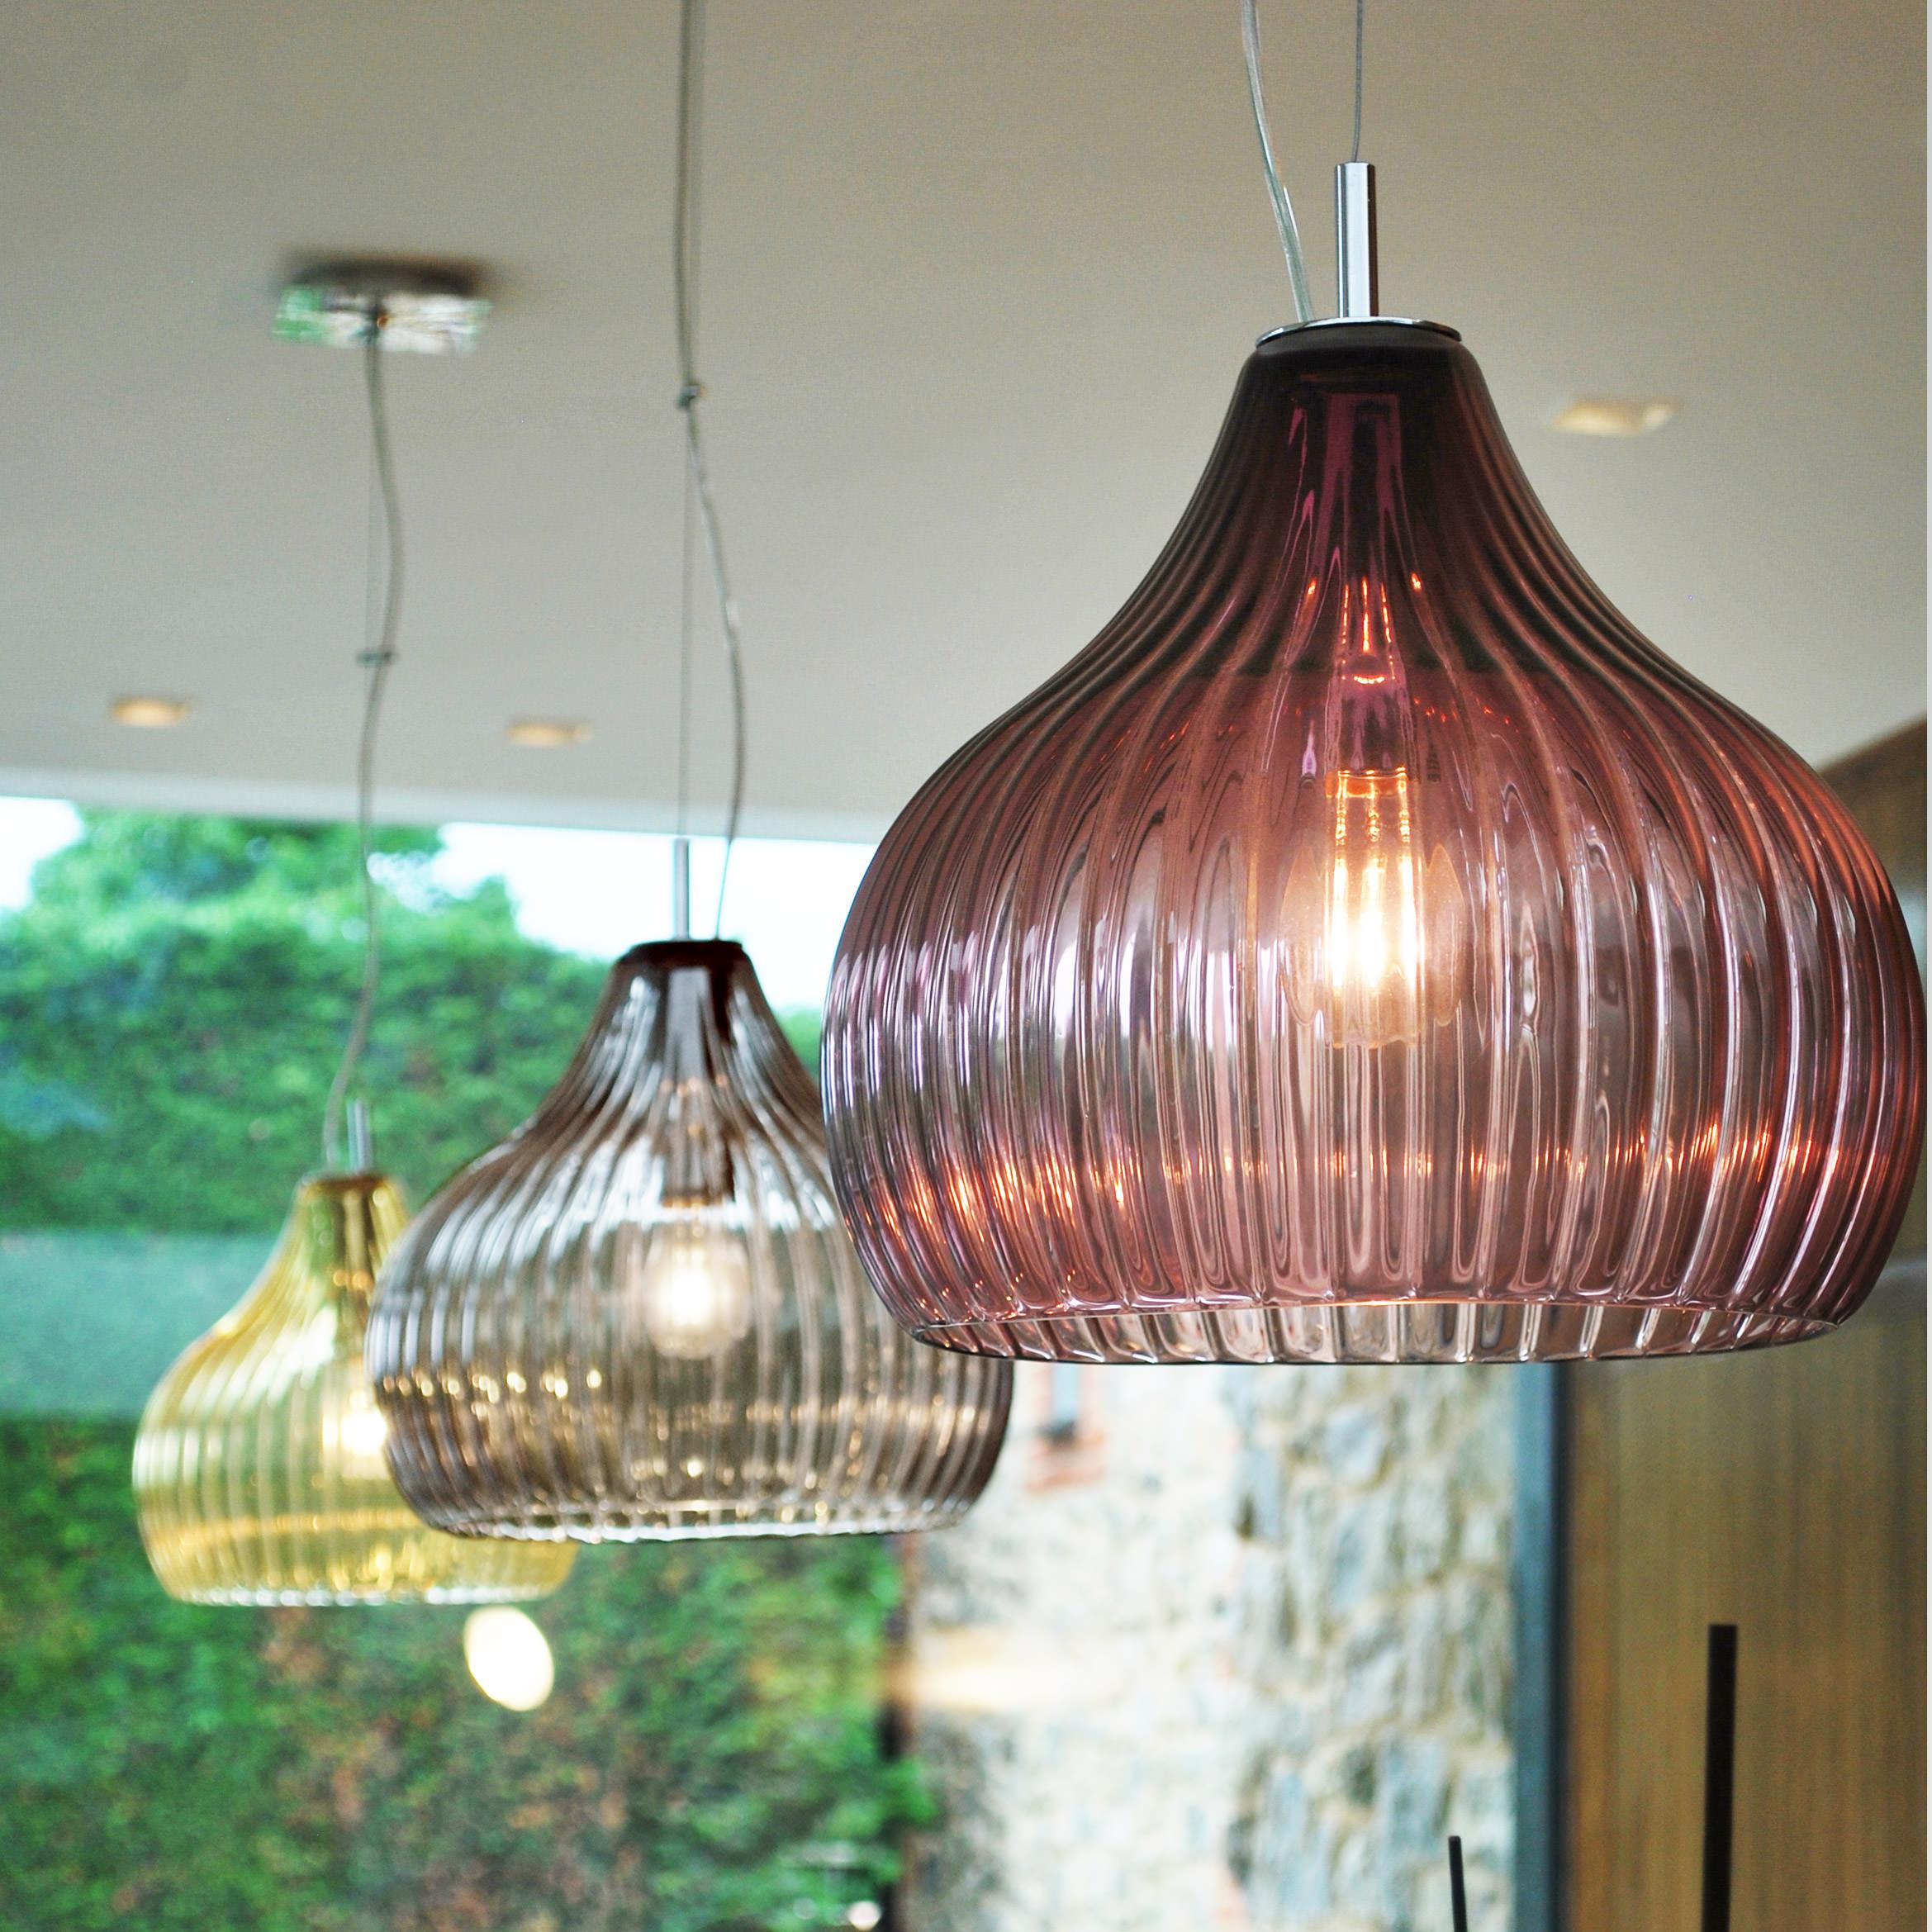 Hudson villaverde london villaverde london hudson ceiling light square2 aloadofball Images